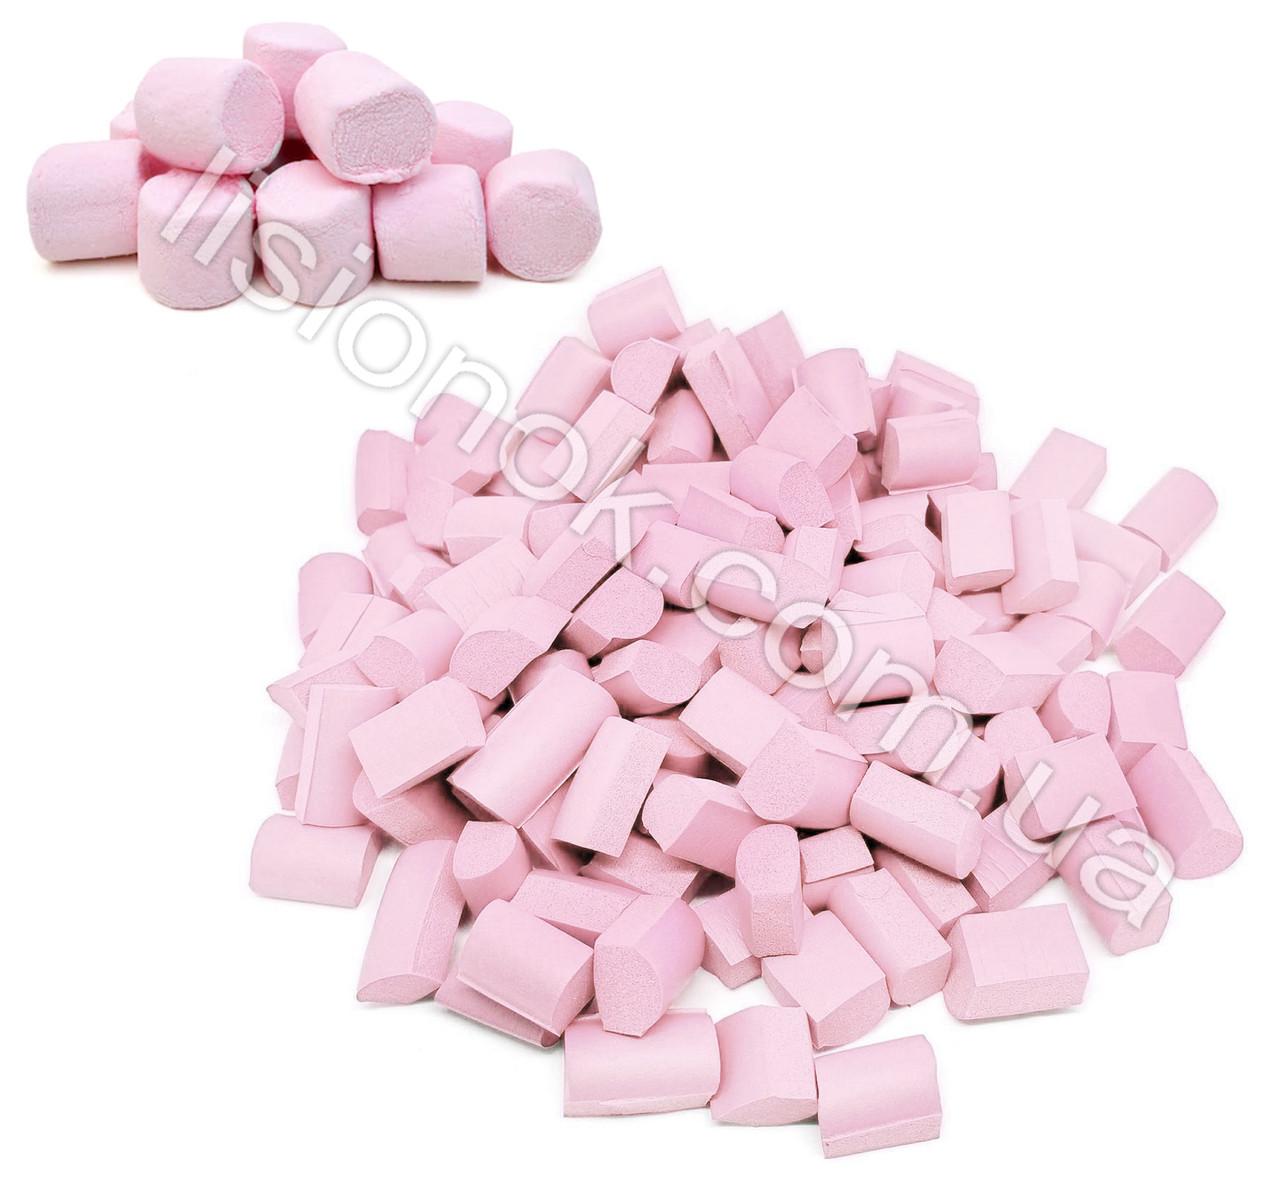 Маршмеллоу Foam Chunks (фоам чанкс), американские добавки для слаймов